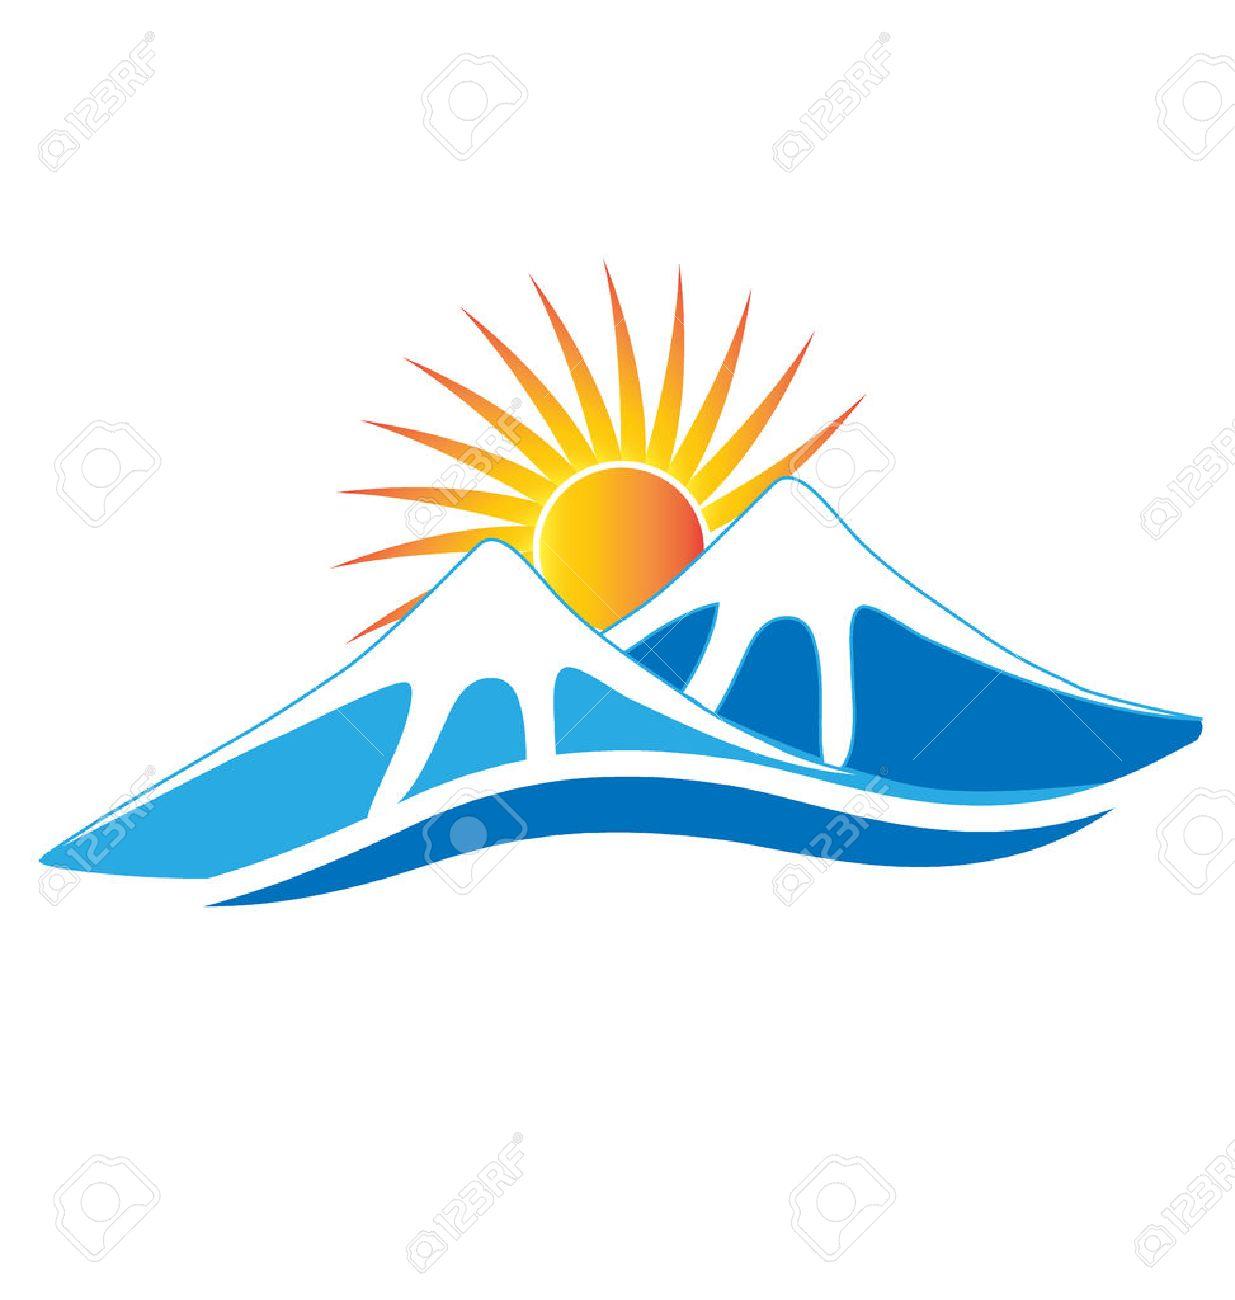 Mountains ice with sun vector image logo design - 57119385